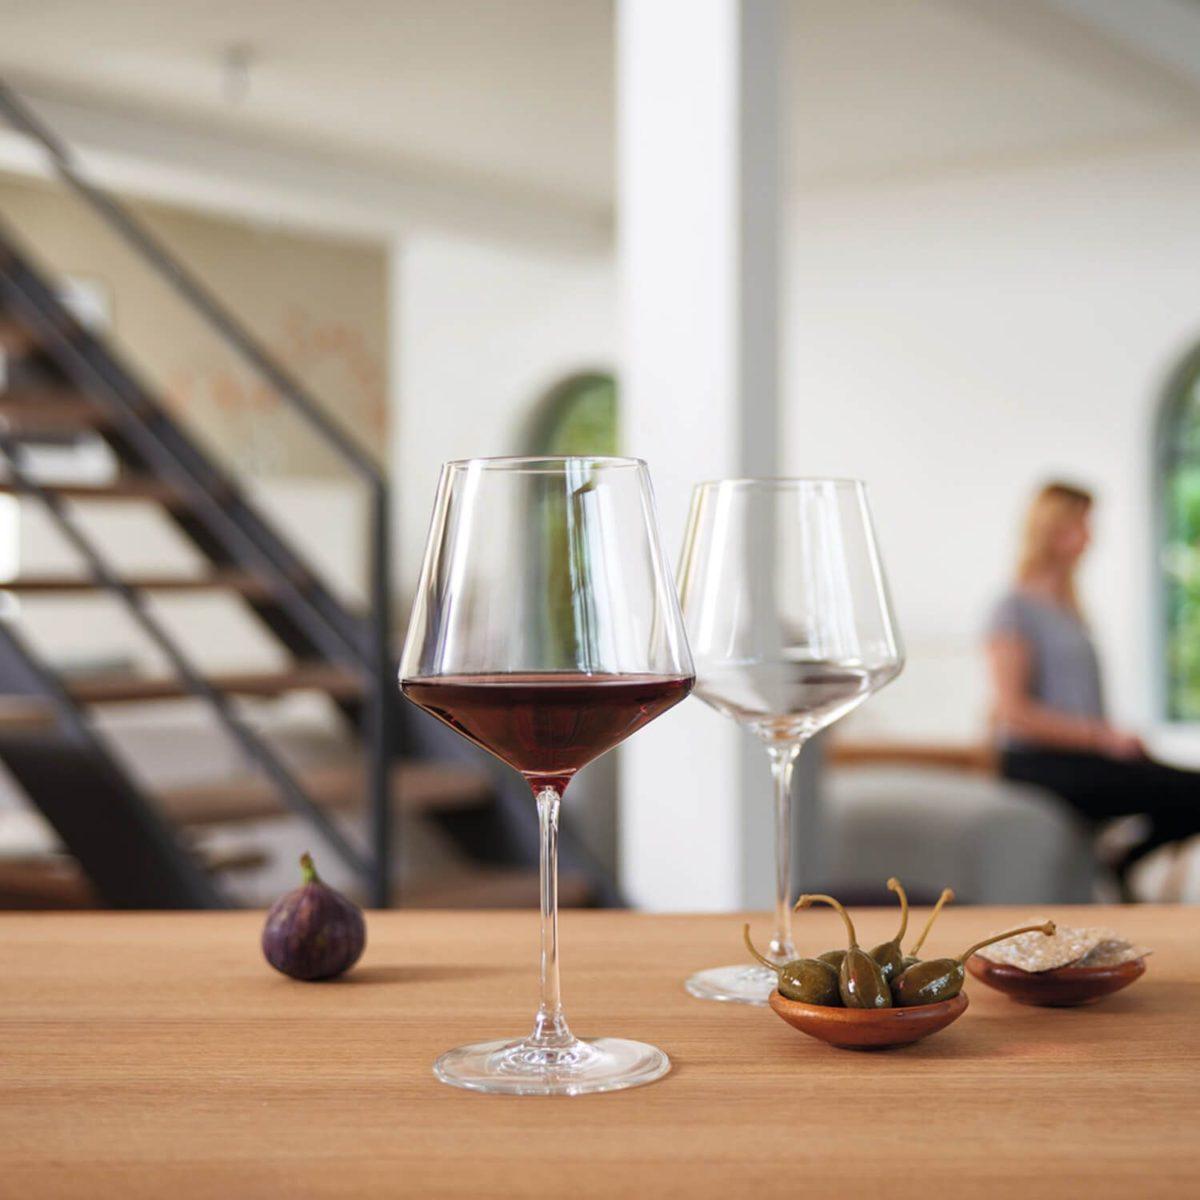 069555 6 k 1200x1200 - Pahar burgundy Puccini 730 ml (L069555)